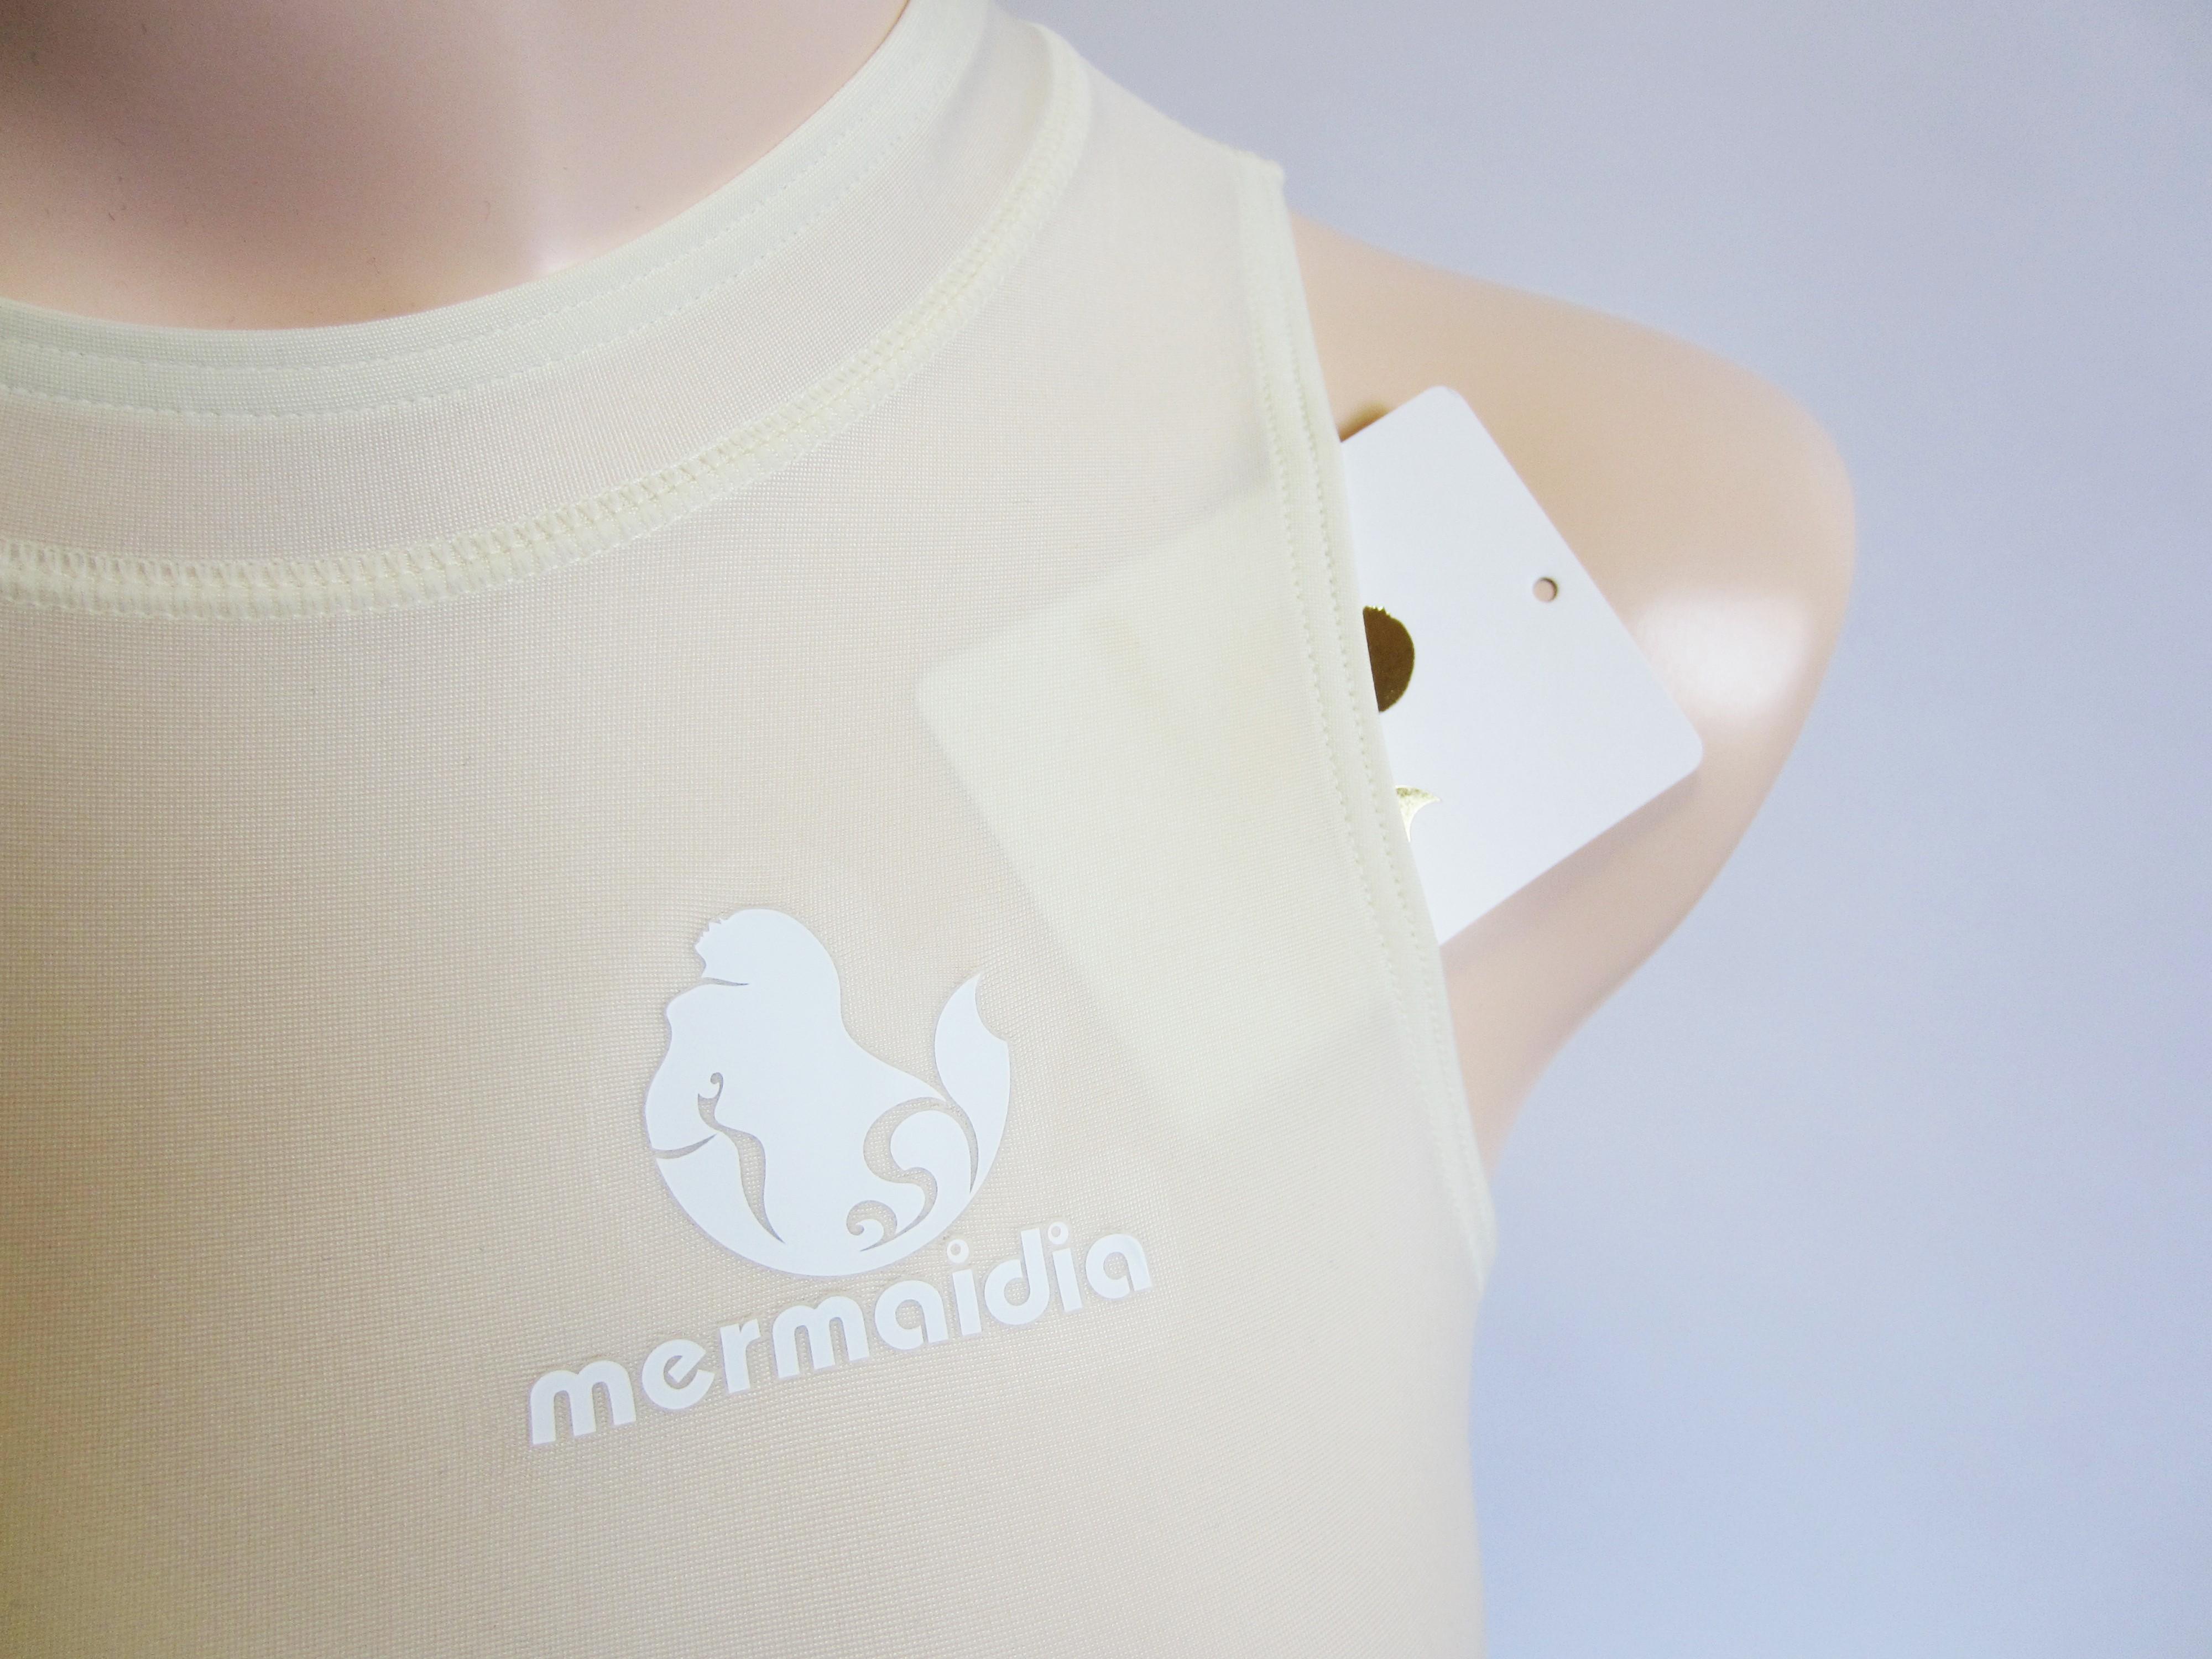 Mermaidia (マーメイディア) 女性用水球水着  ミルクティー